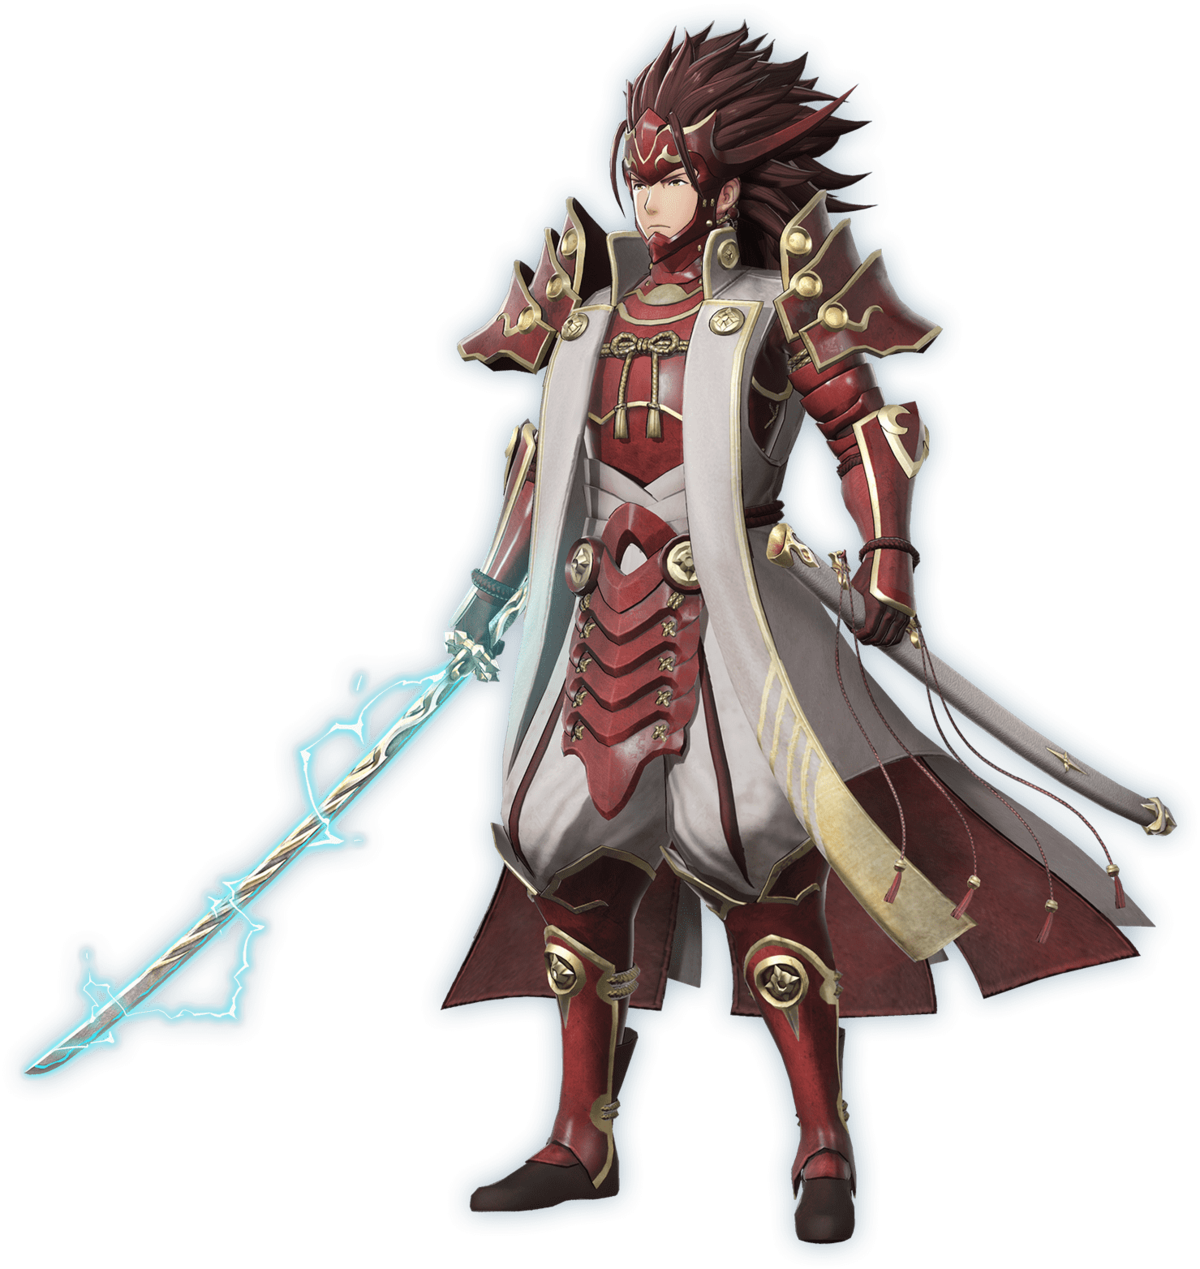 Ryoma: Supreme Samurai - Fire Emblem Heroes Wiki